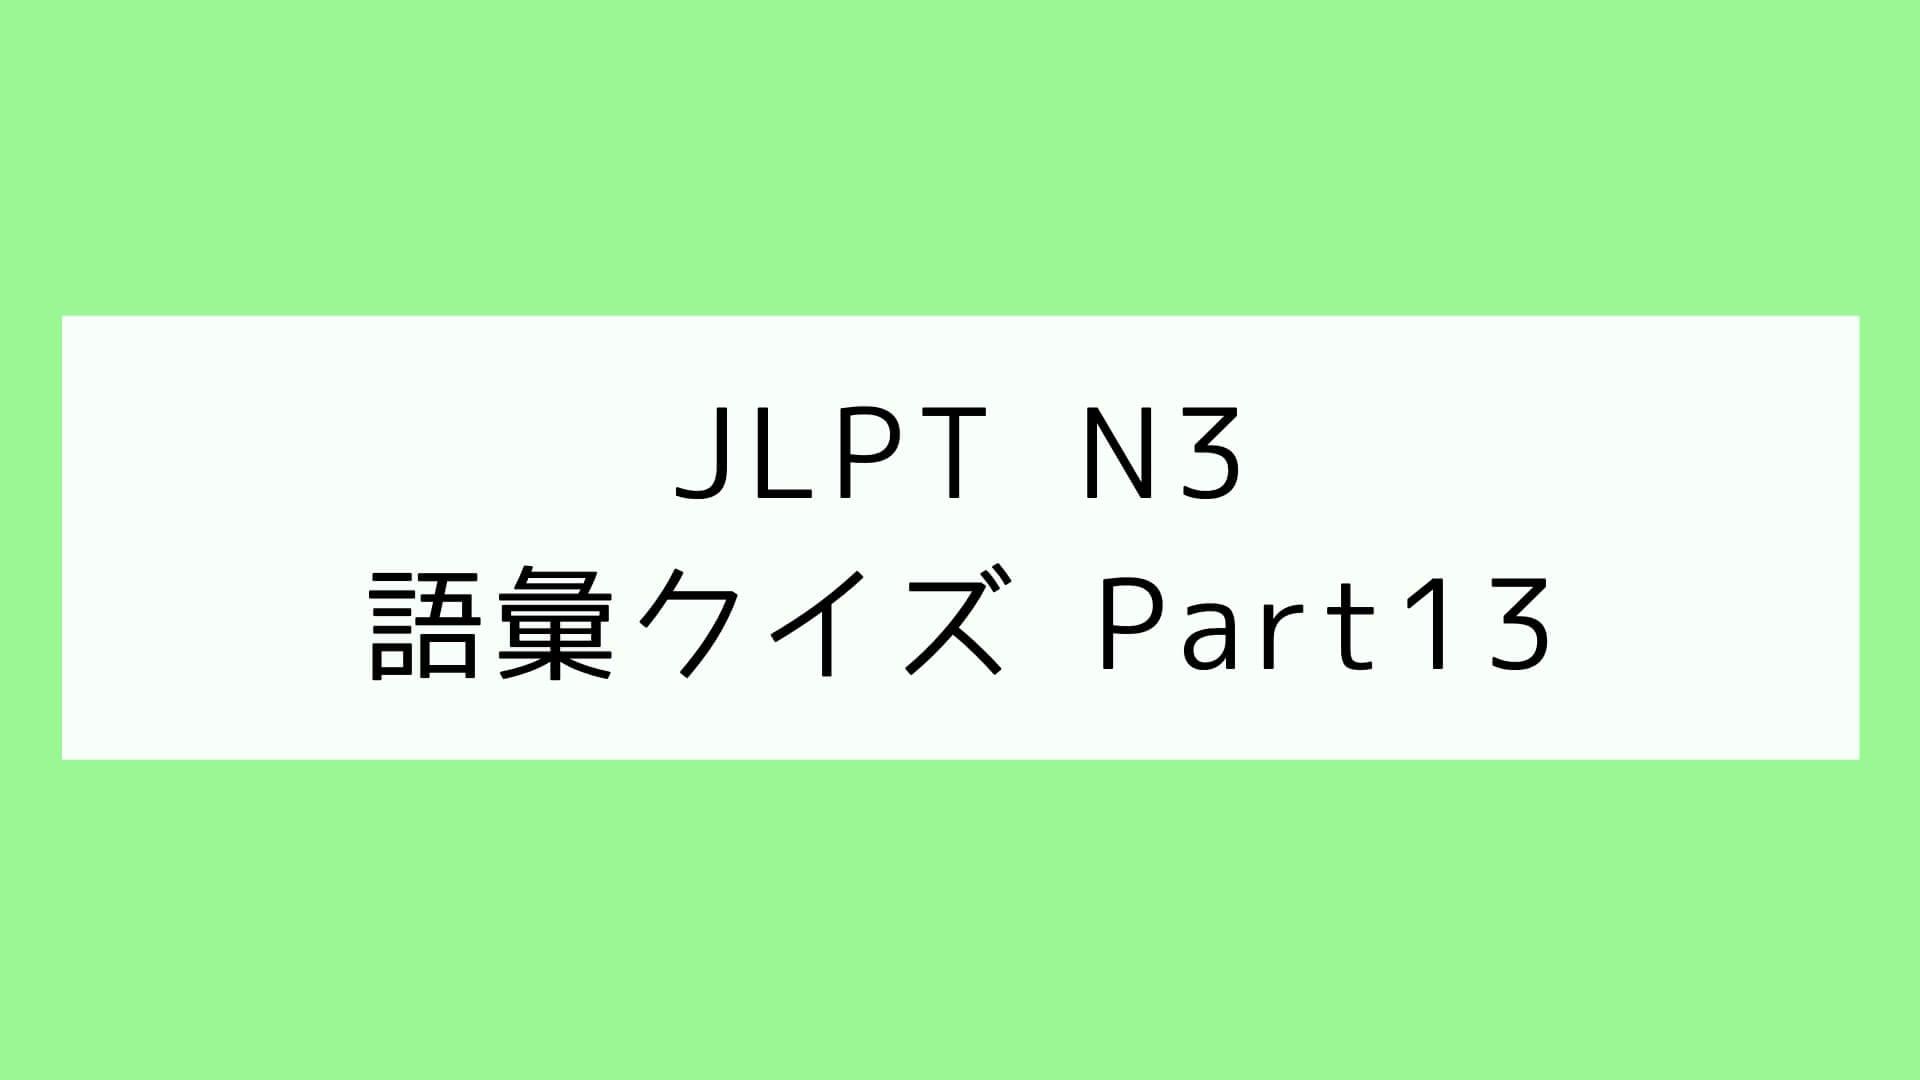 【JLPT N3】語彙クイズ Part13